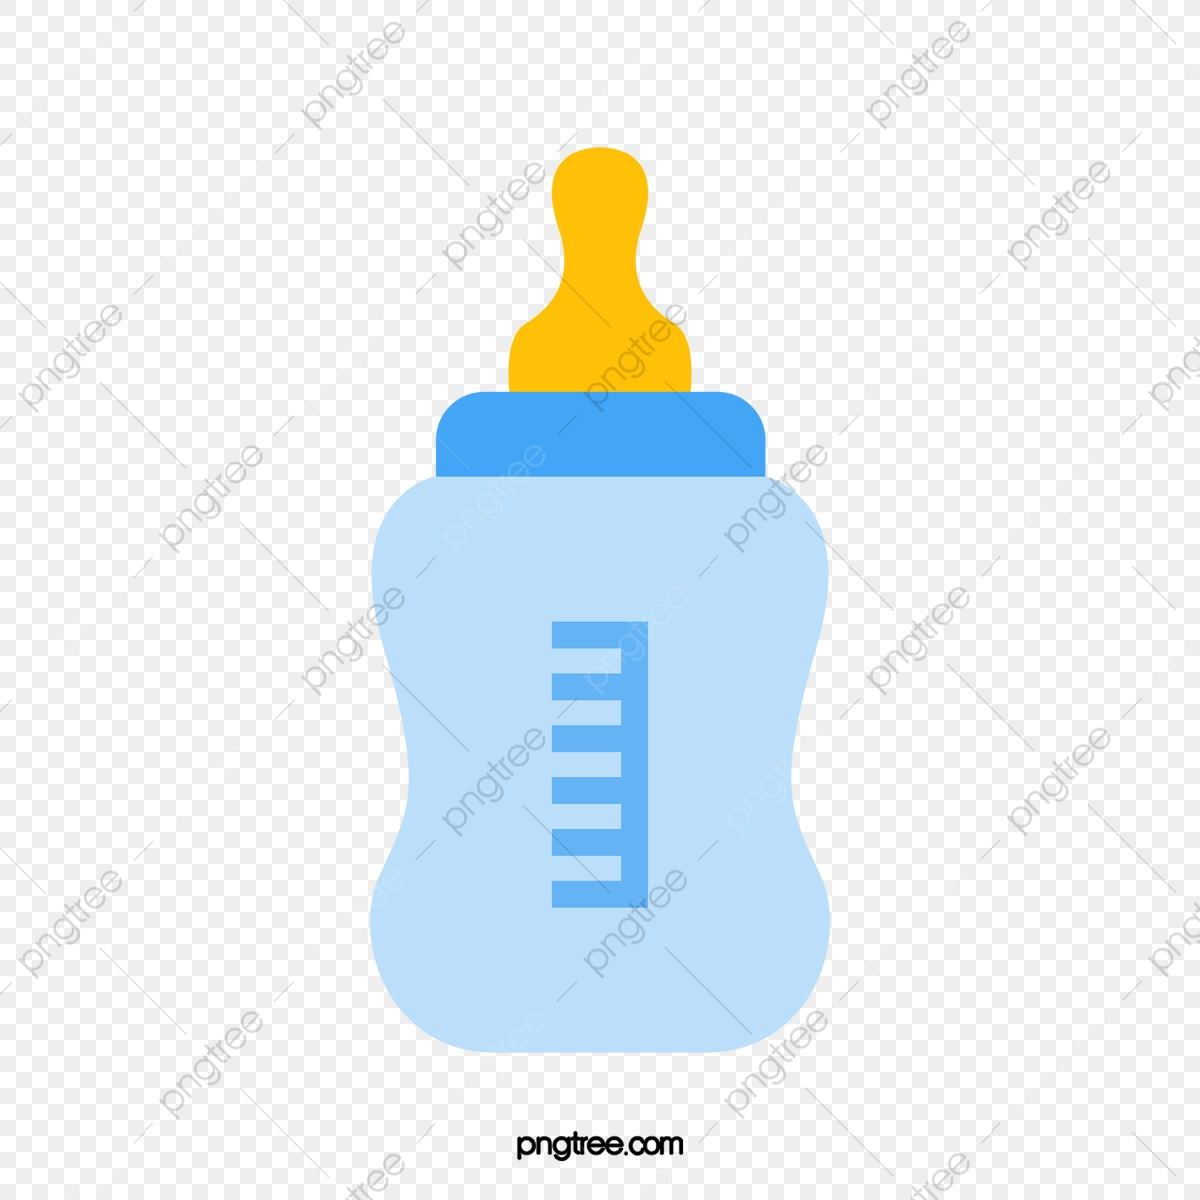 Feeding Bottle, Bottle Clipart, Baby Bottle PNG Transparent Clipart.